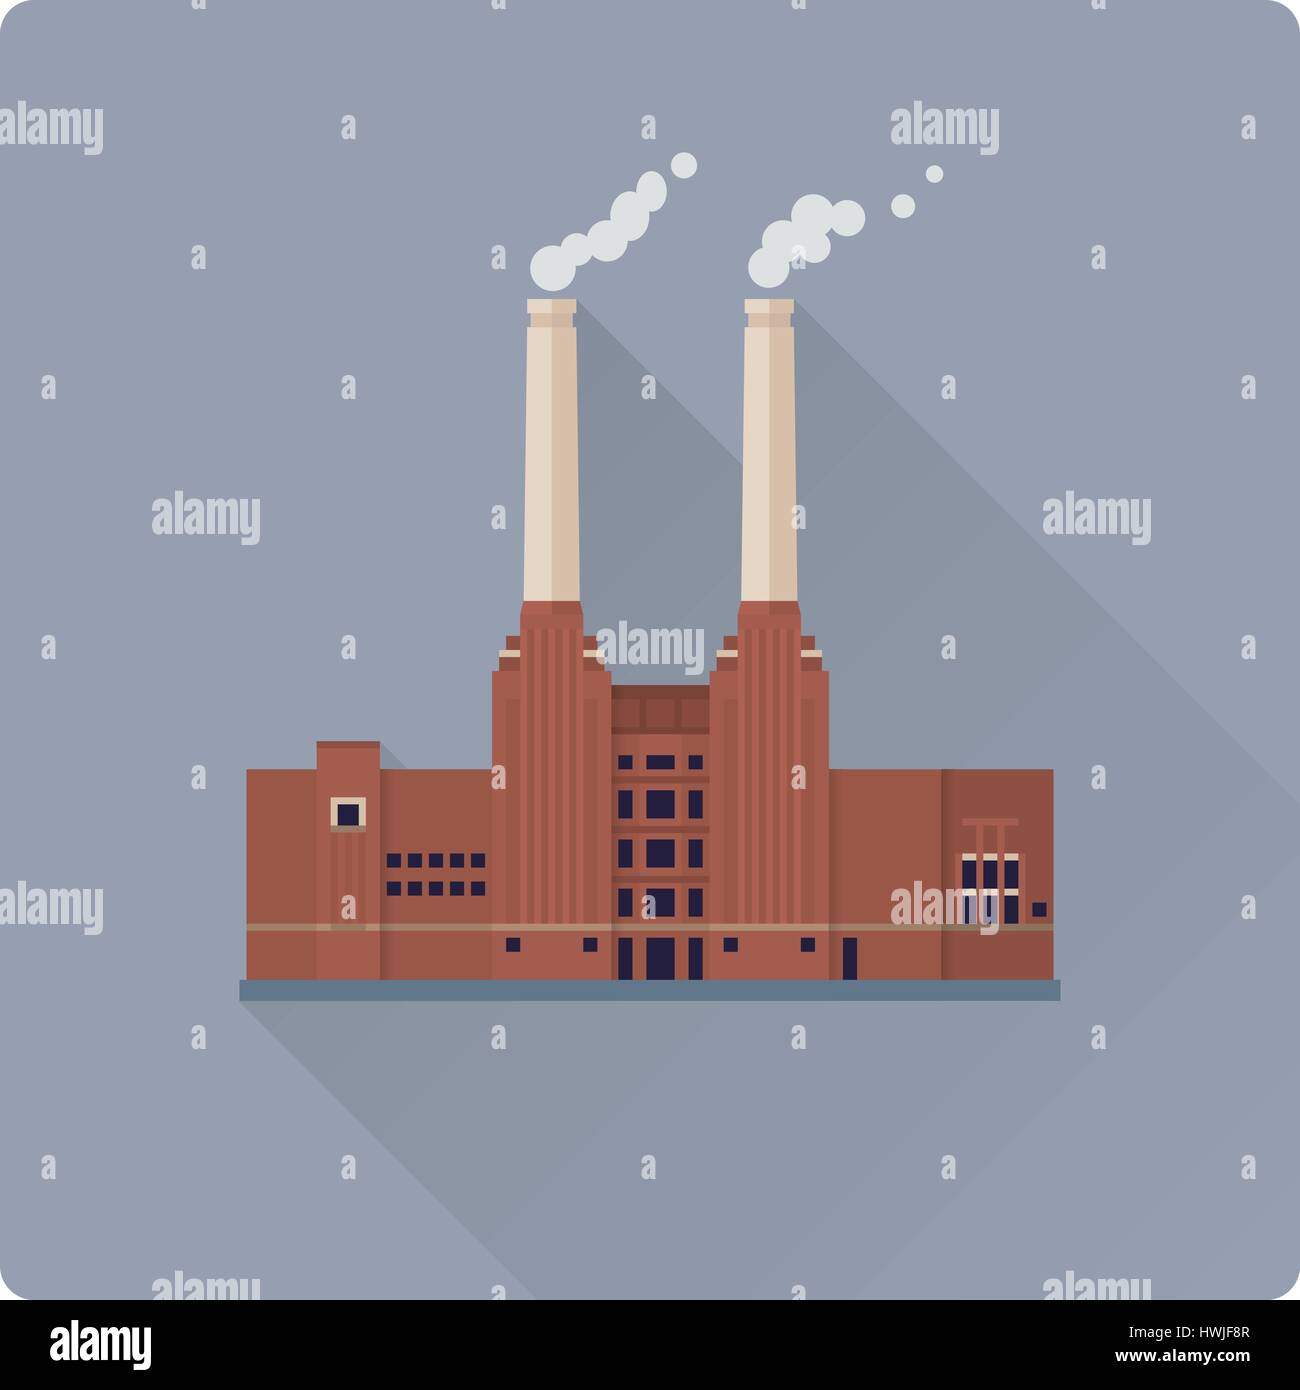 flat design long shadow coal power plant building vector illustration - Stock Vector